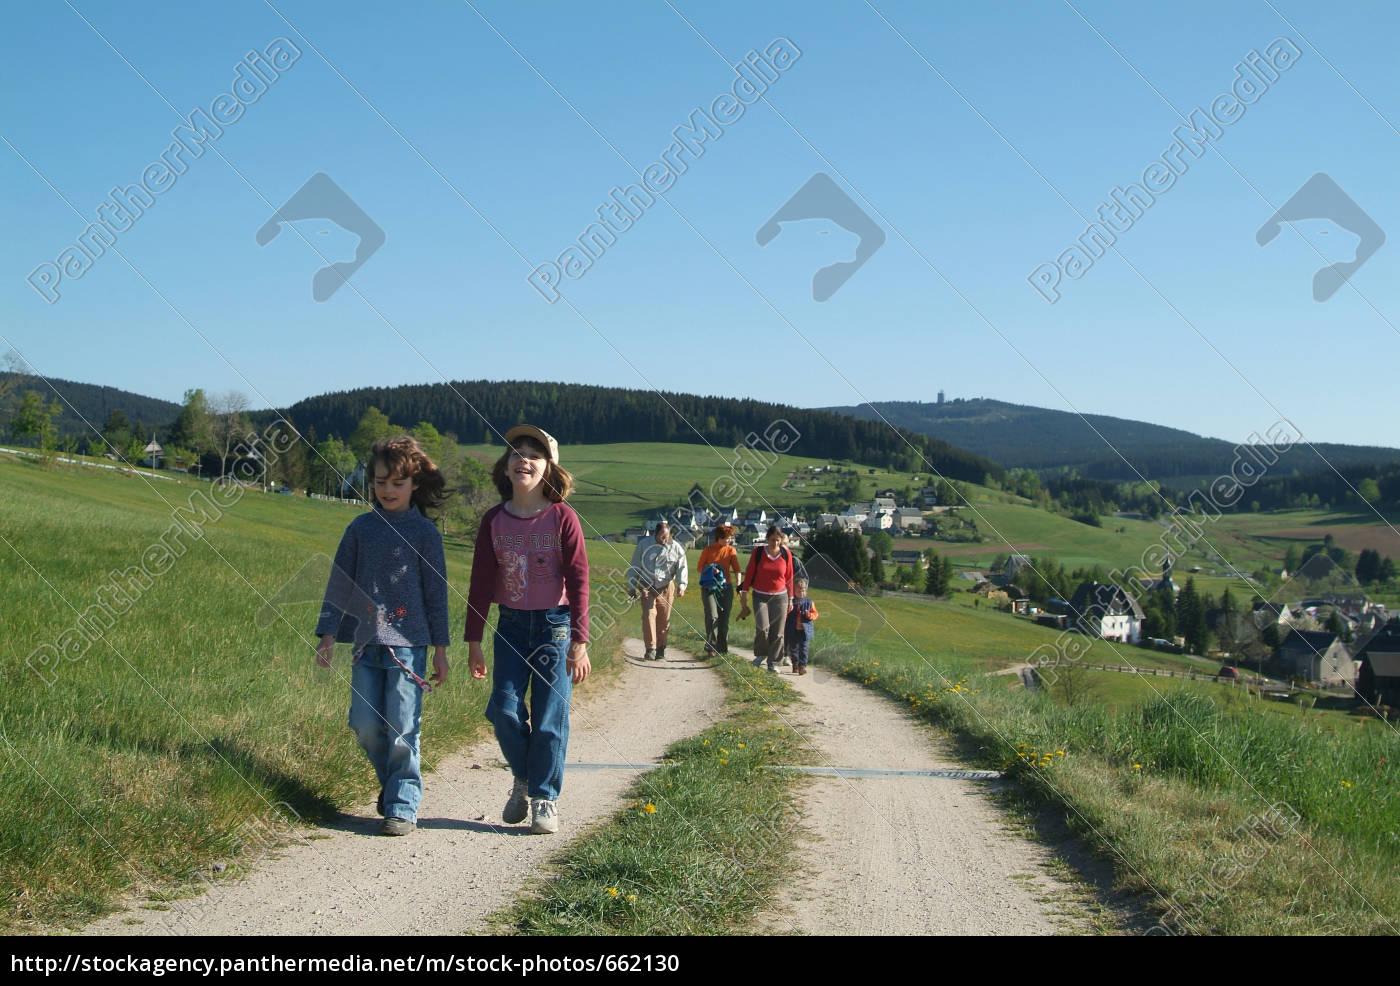 walk - 662130